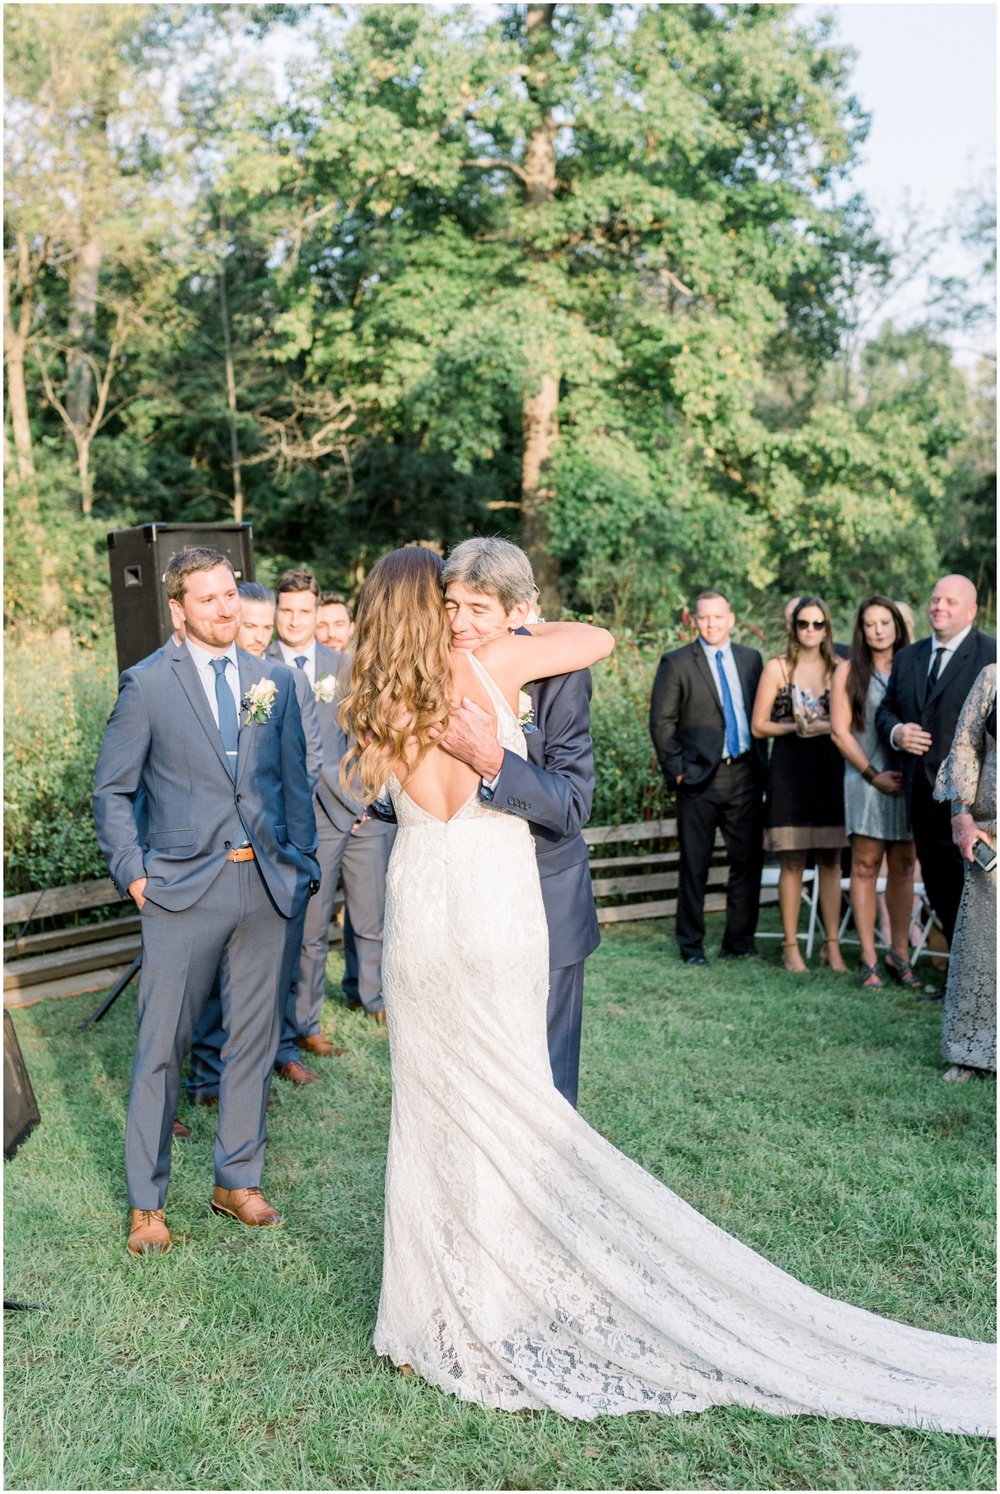 Summer Wedding at Philander Chase Knox Estate in Malvern, PA - Krista Brackin Photography_0116.jpg